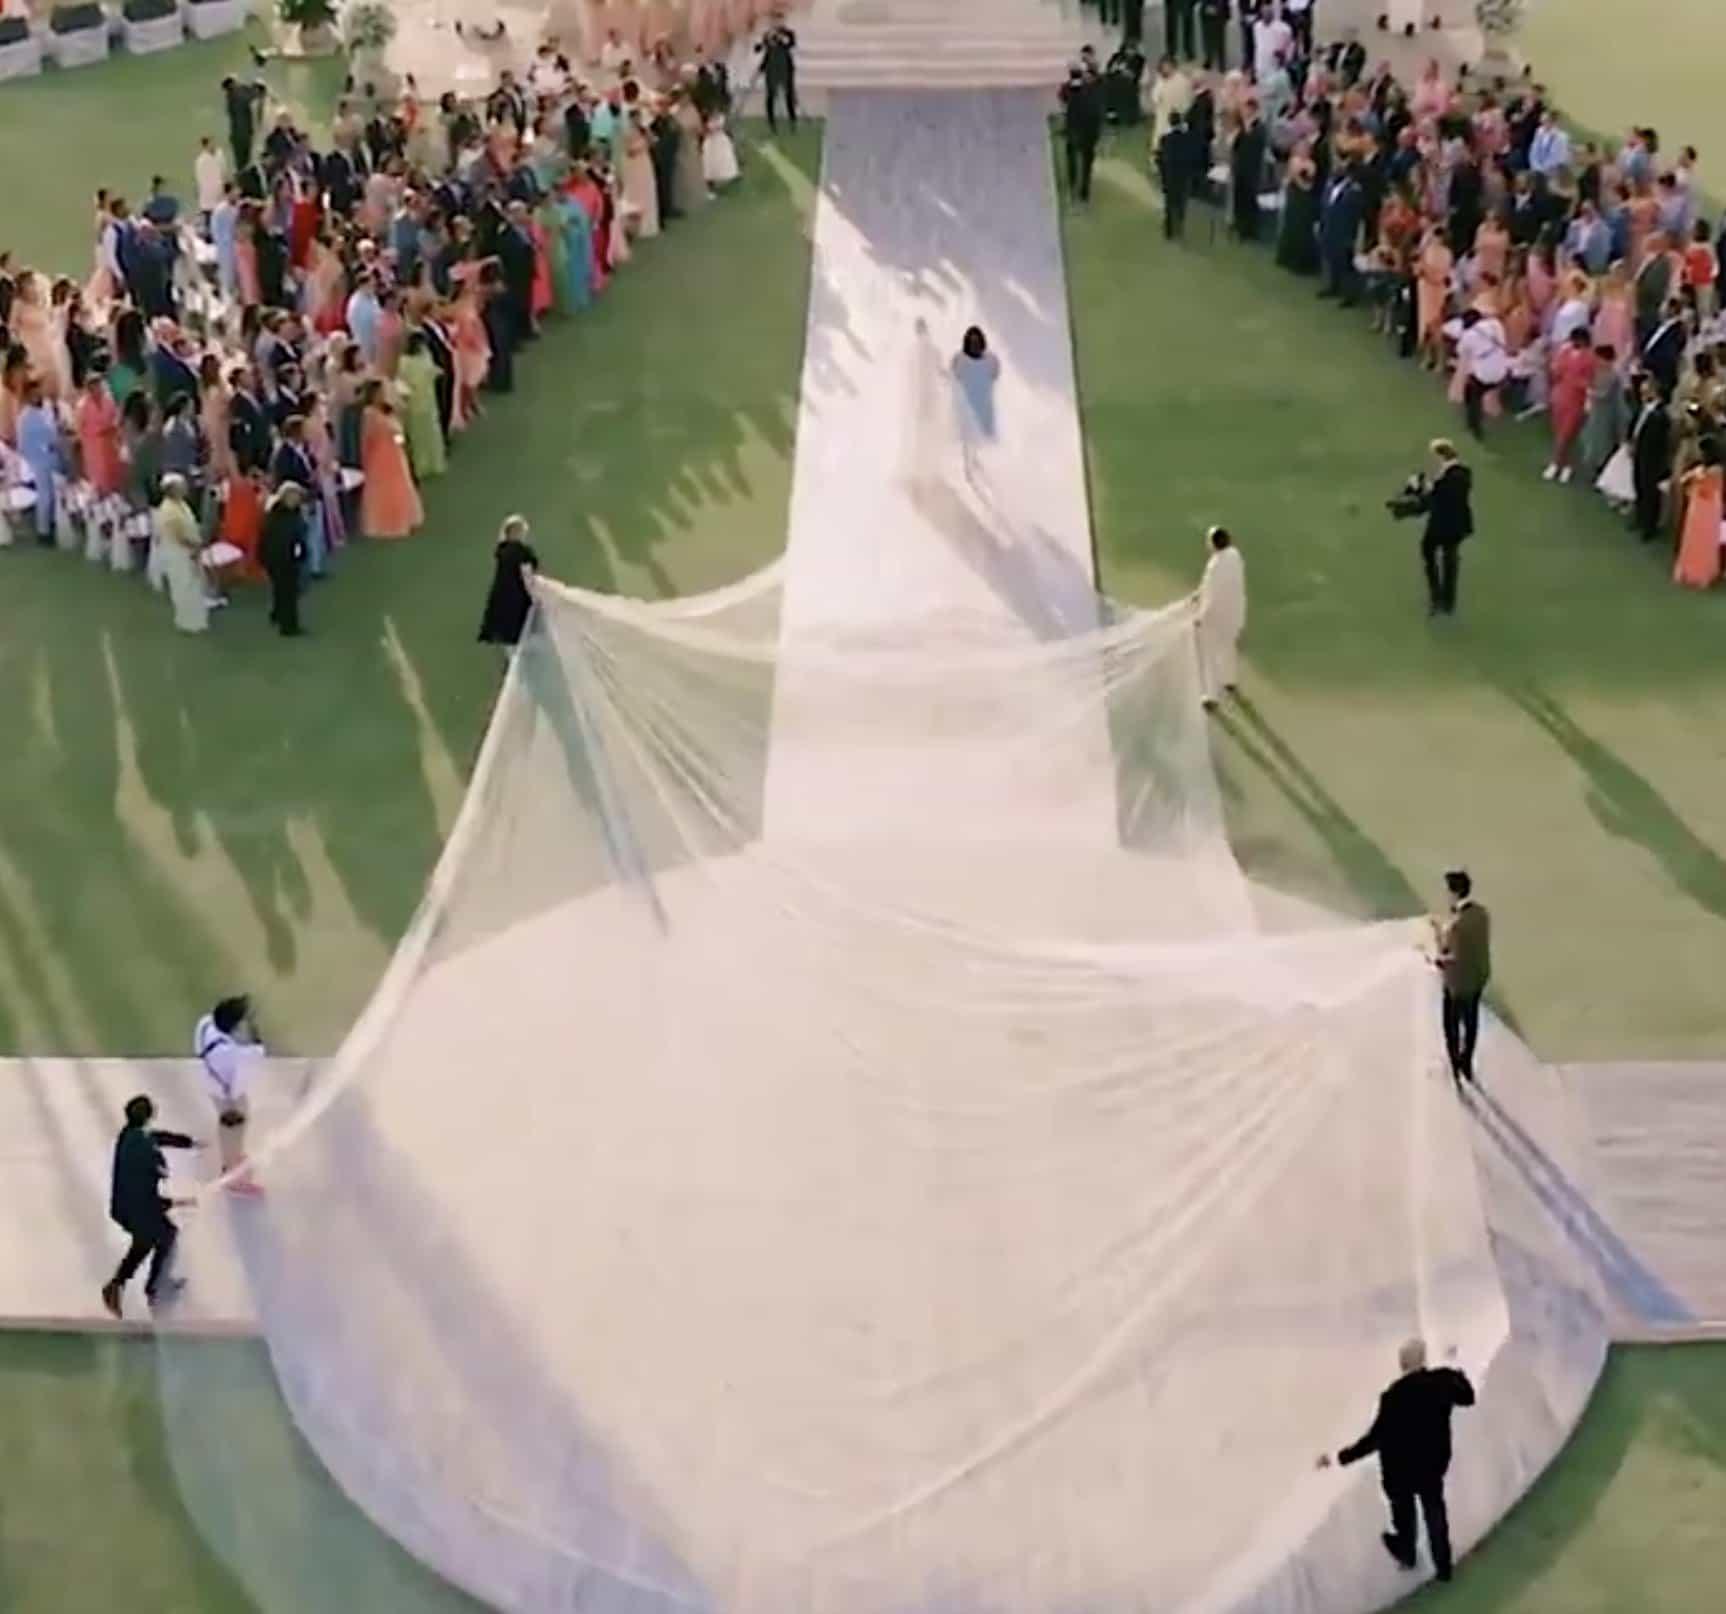 Priyanka Chopra and THAT wedding dress